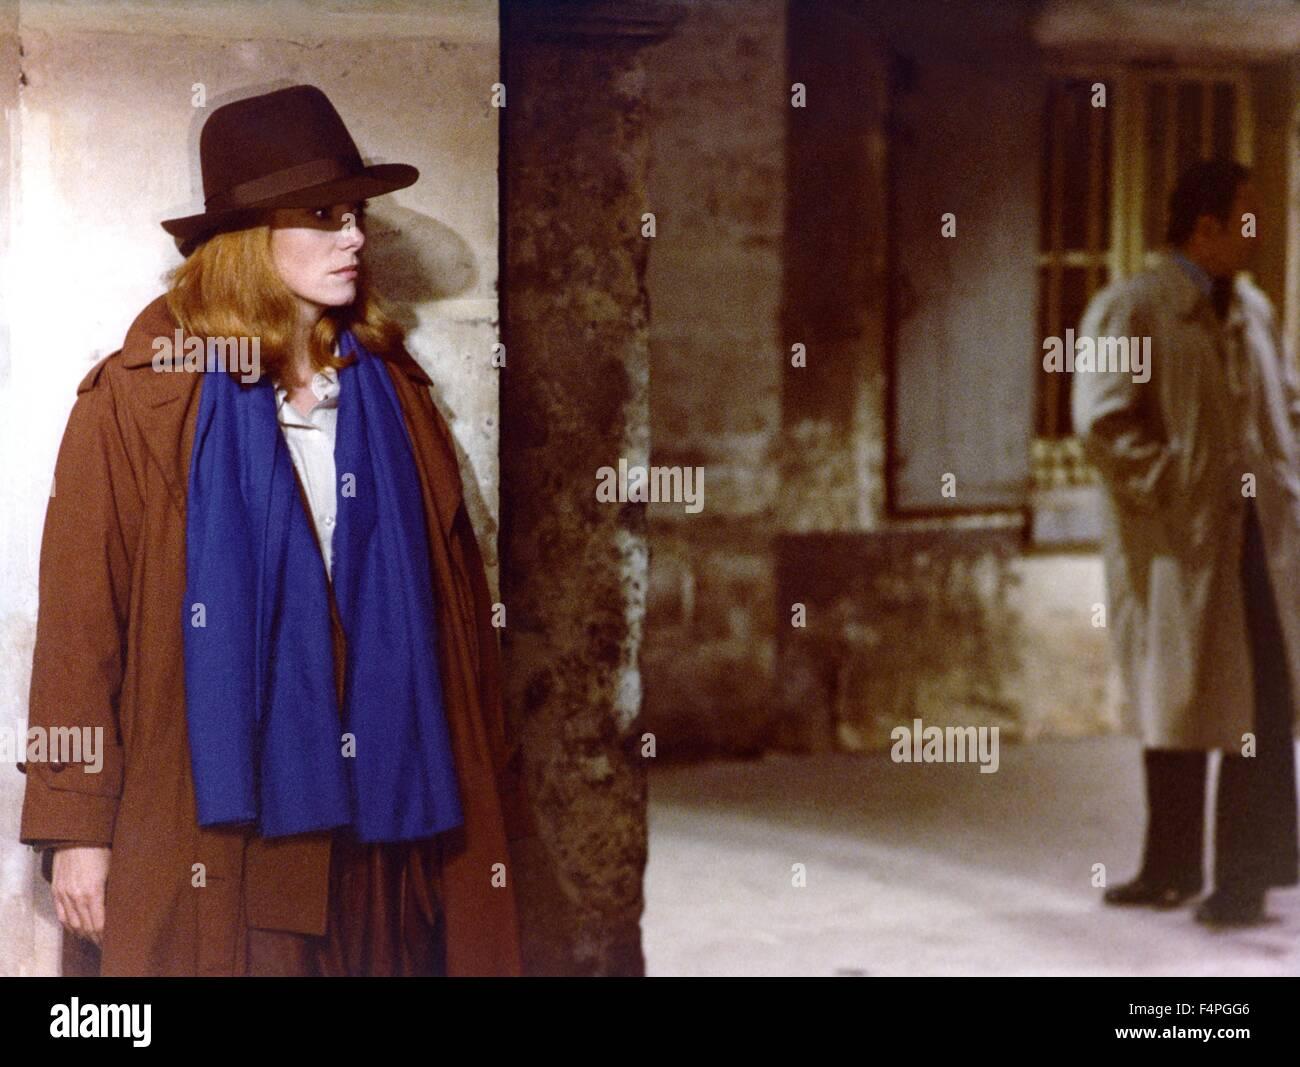 Catherine Deneuve / Look See... / 1978 directed by Hugo Santiago - Stock Image